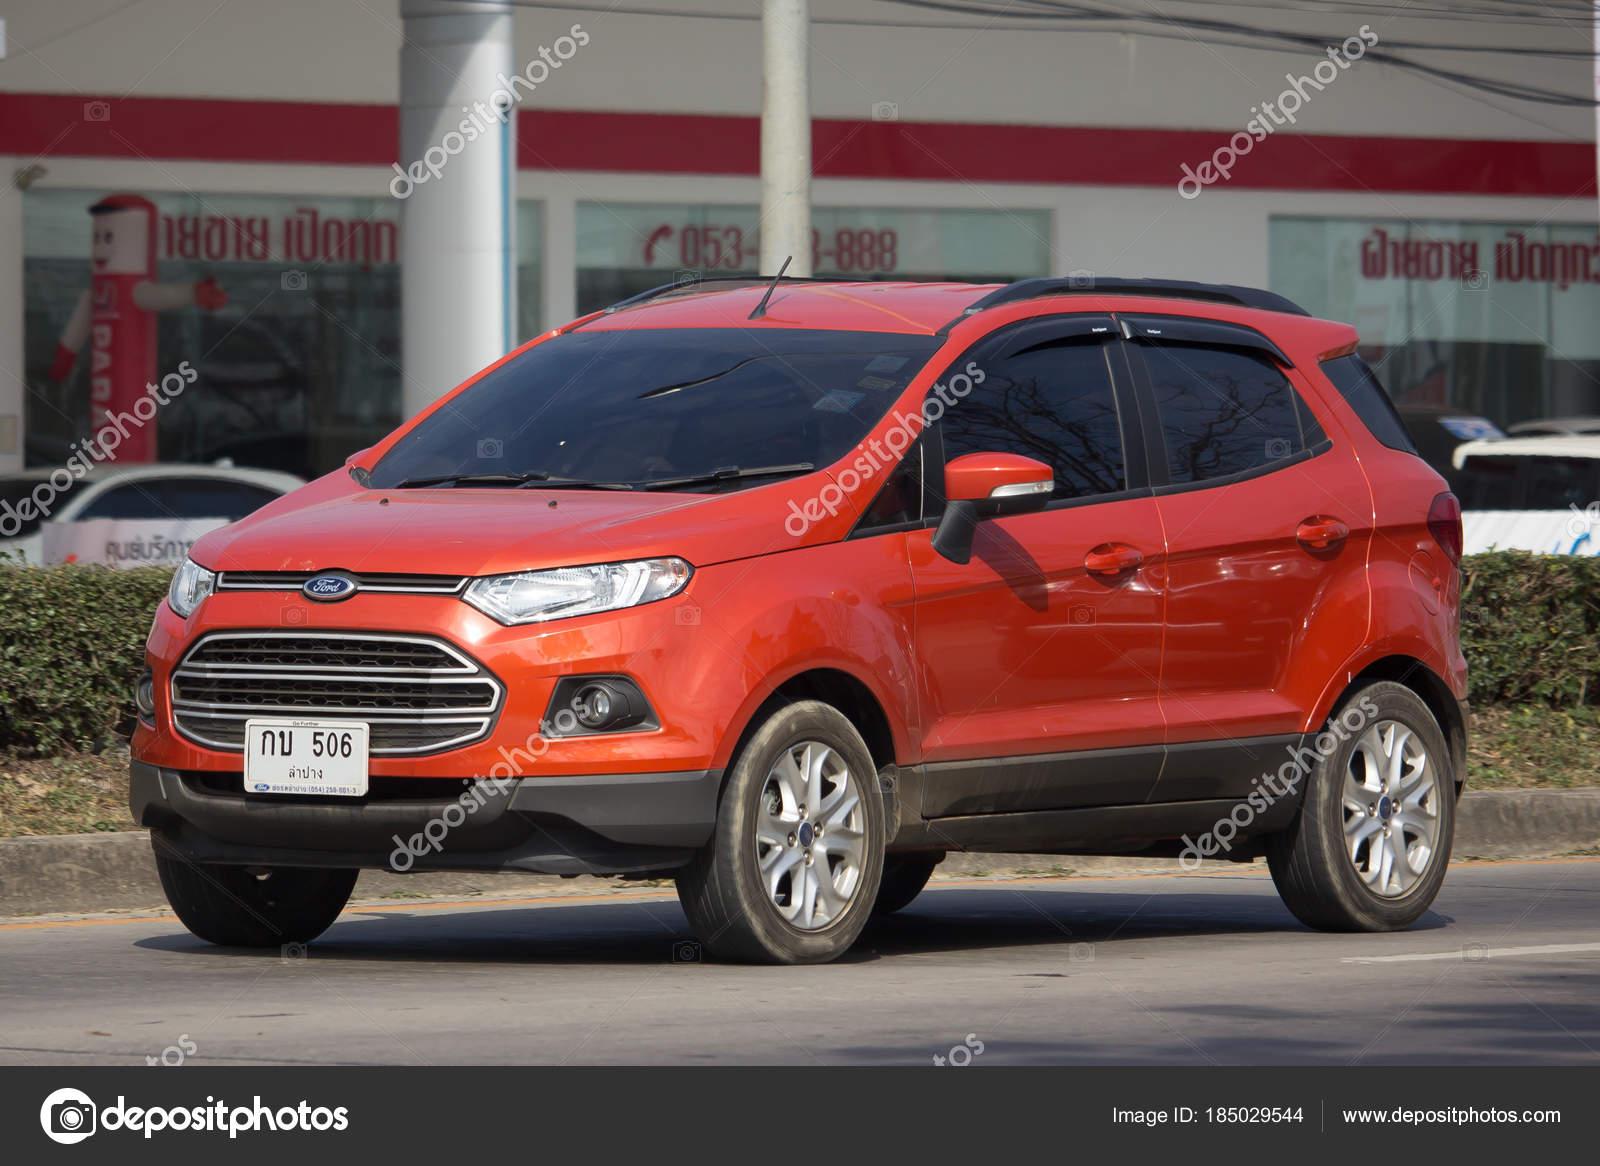 Private Car Ford Ecosport Suv Car For Urban User Stock Editorial